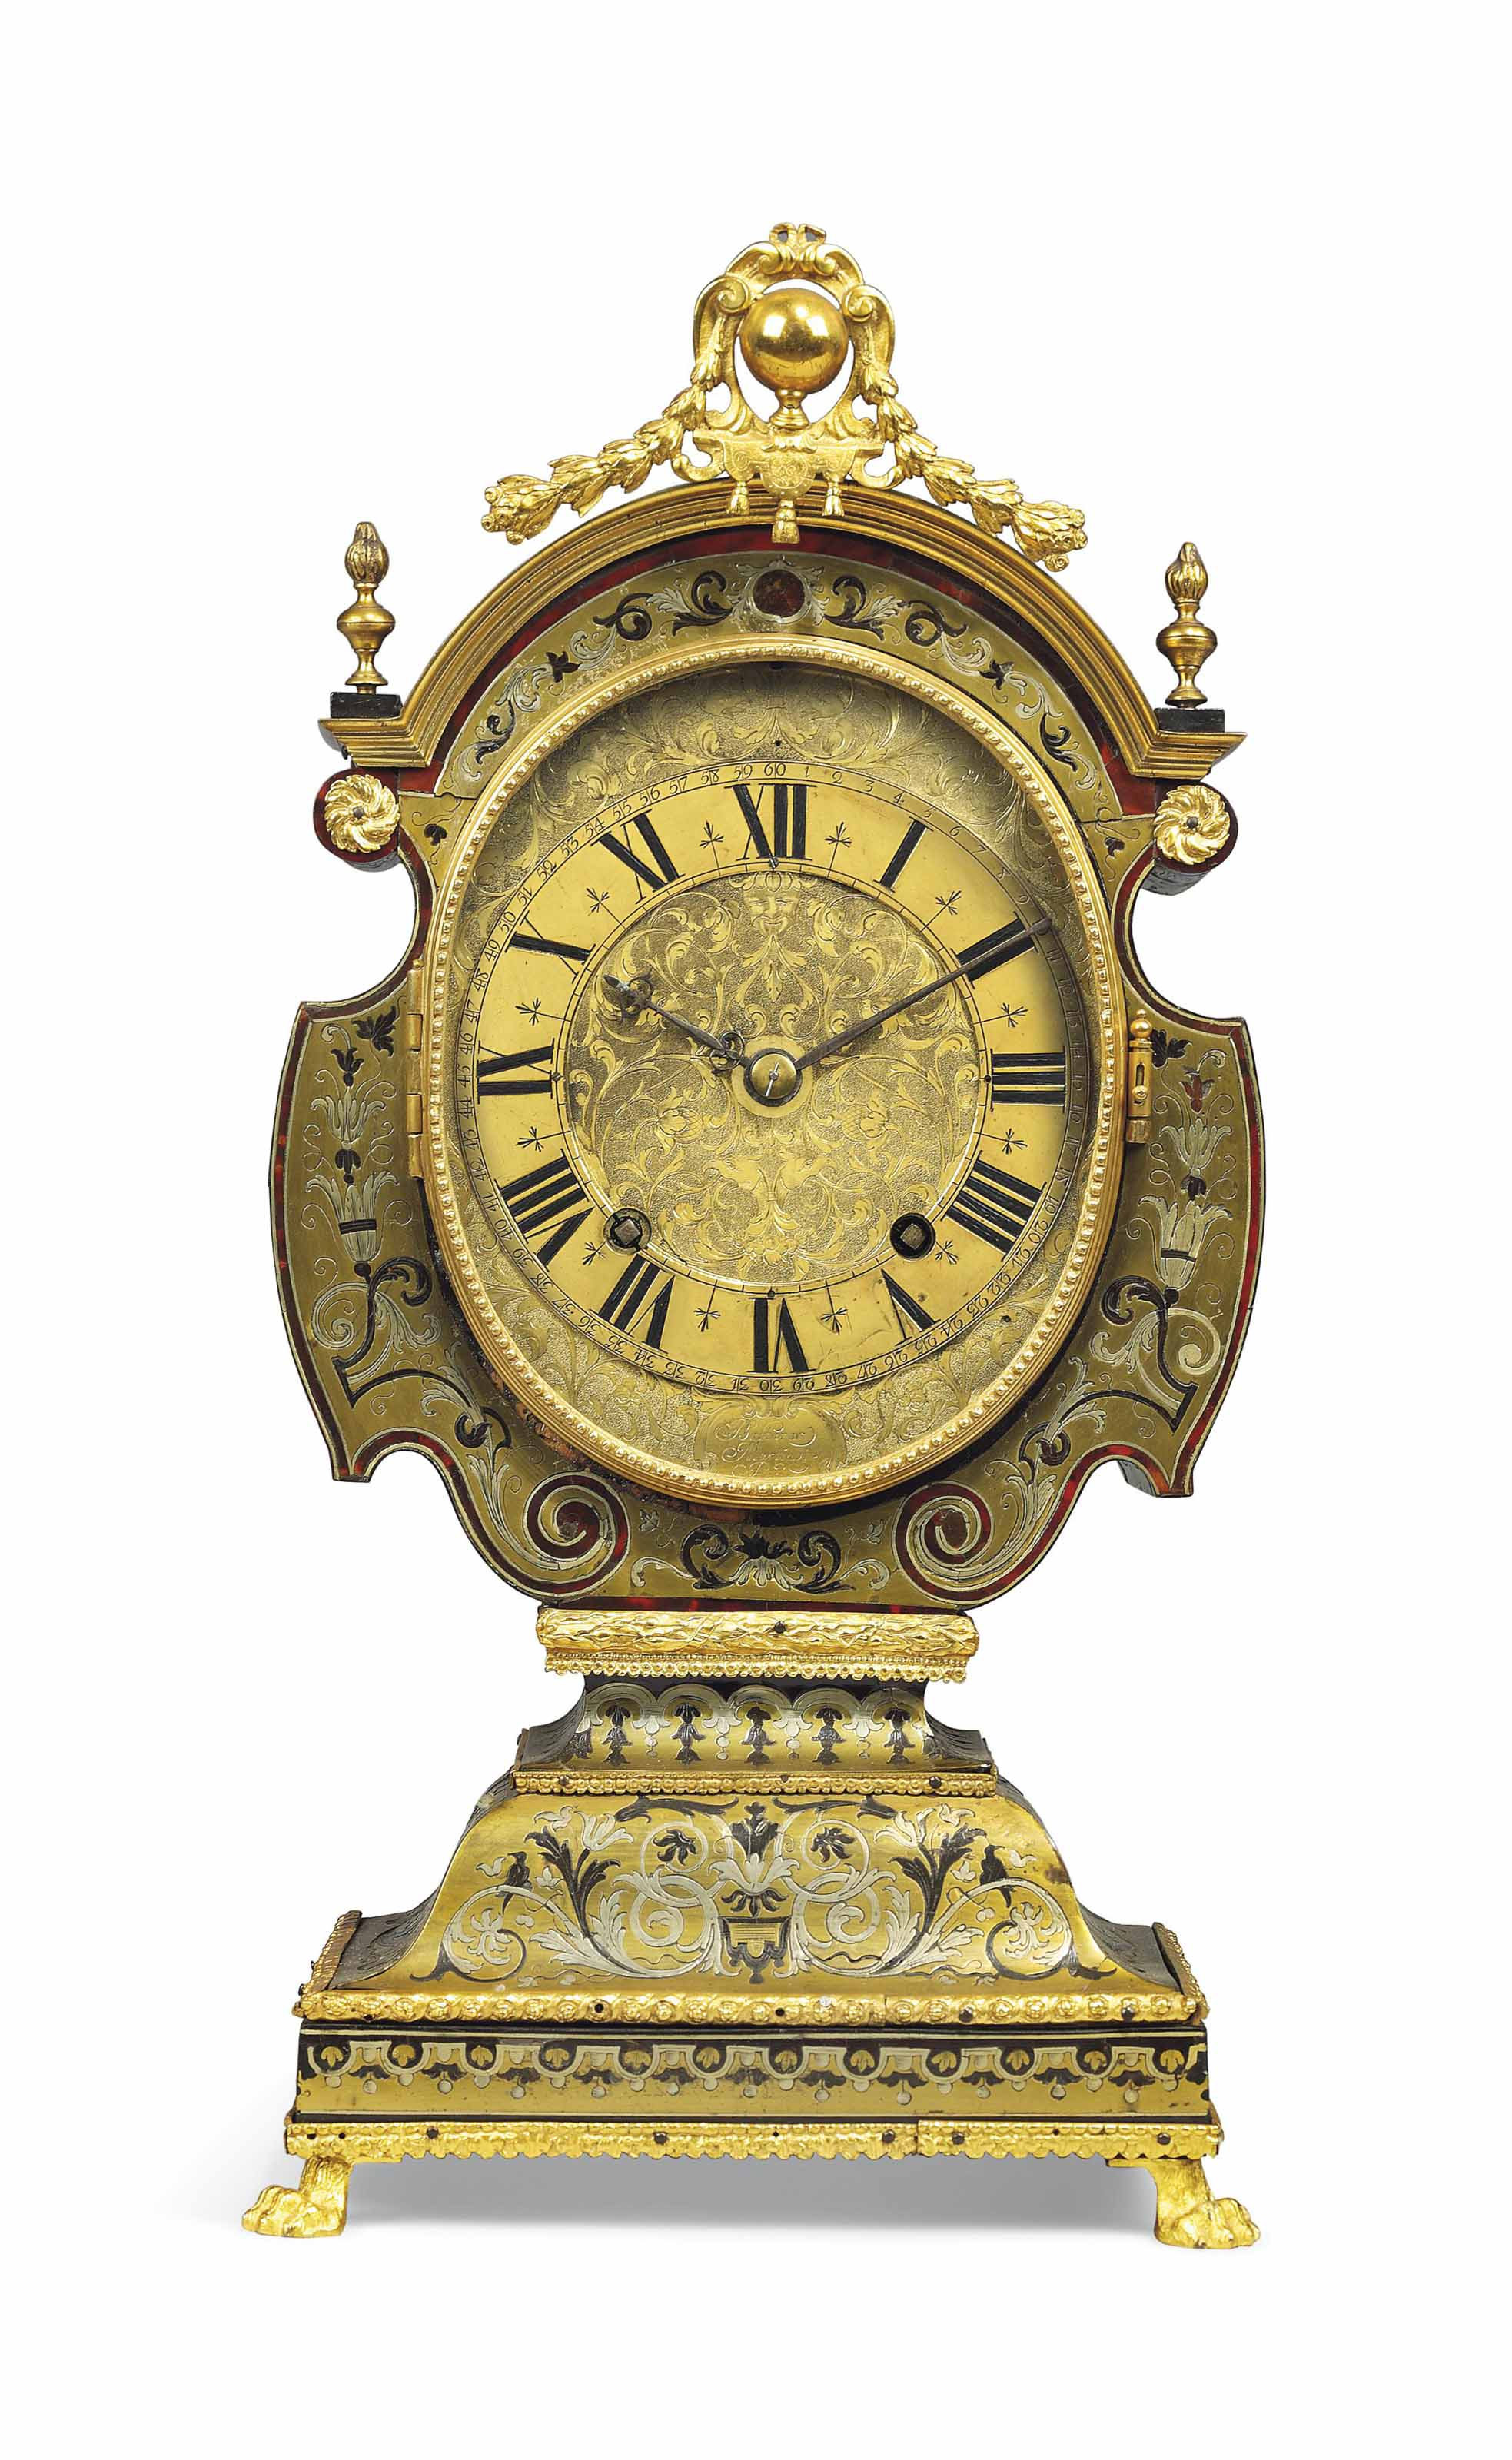 A LOUIS XIV TORTOISESHELL, BRASS AND PEWTER-INLAID STRIKING 'TETE DE POUPEE' CLOCK